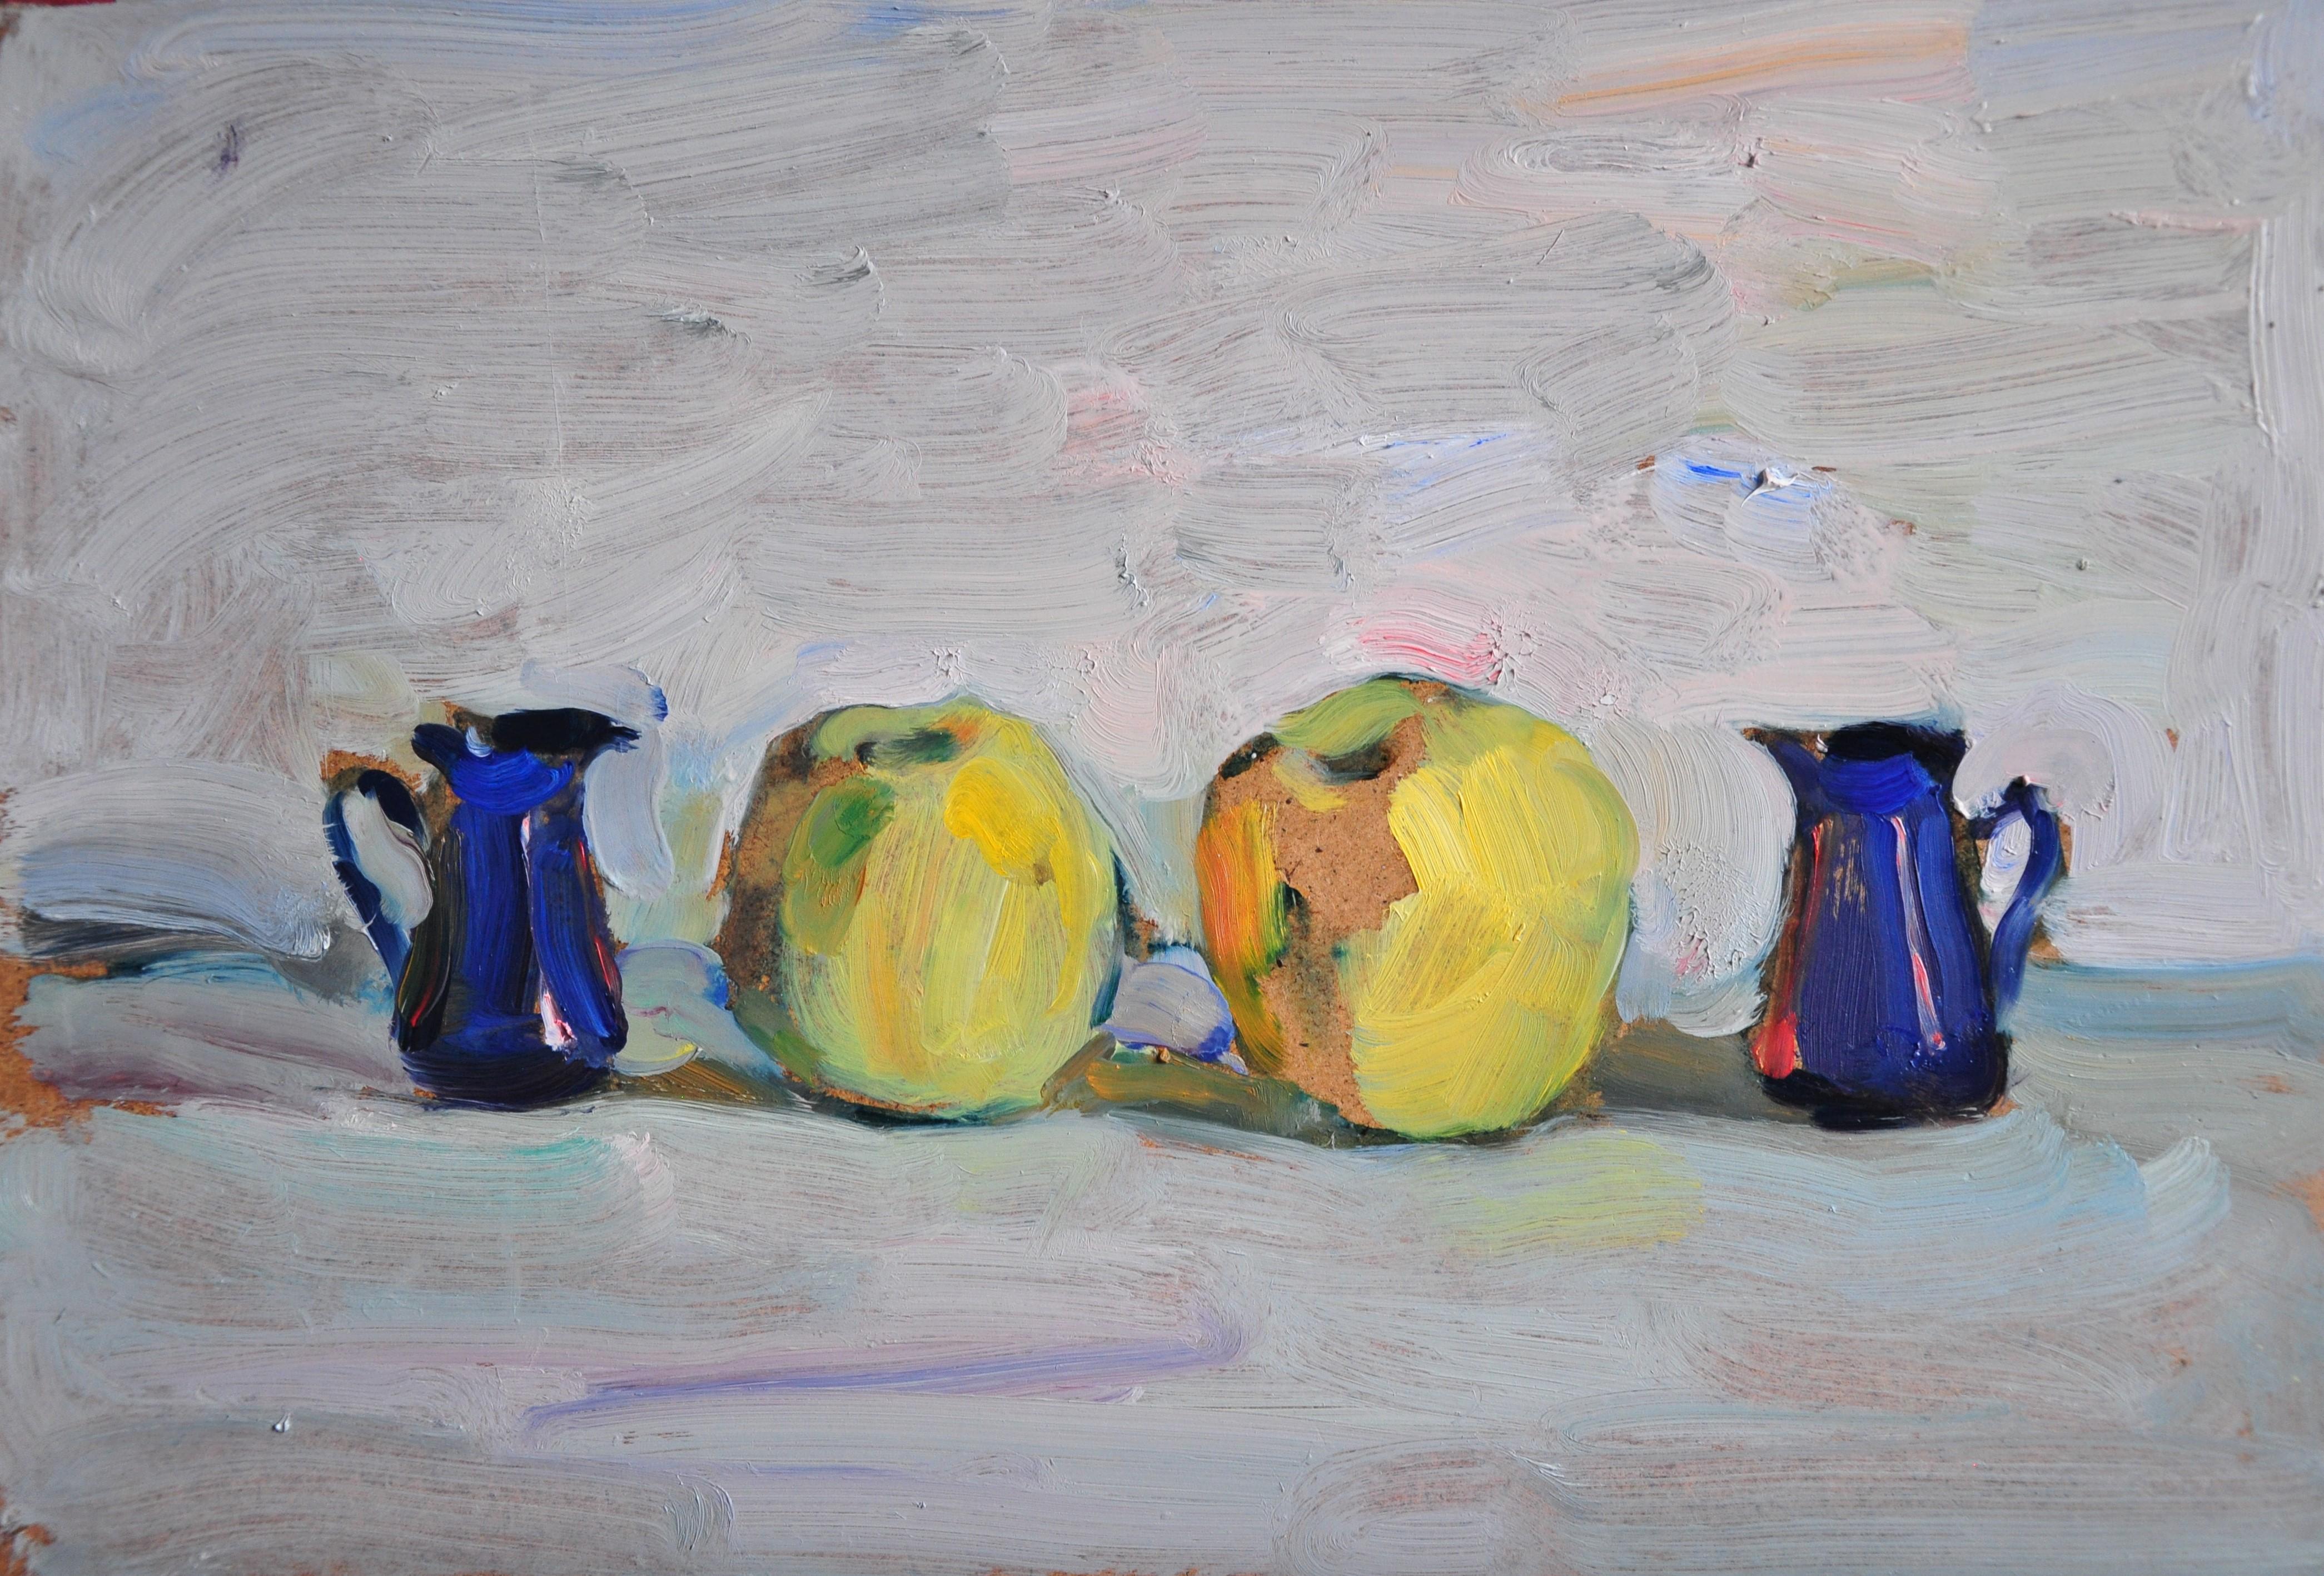 Two Blue Two Yellow - Yaroslava Tichshenko 21st Century Contemporary Painting